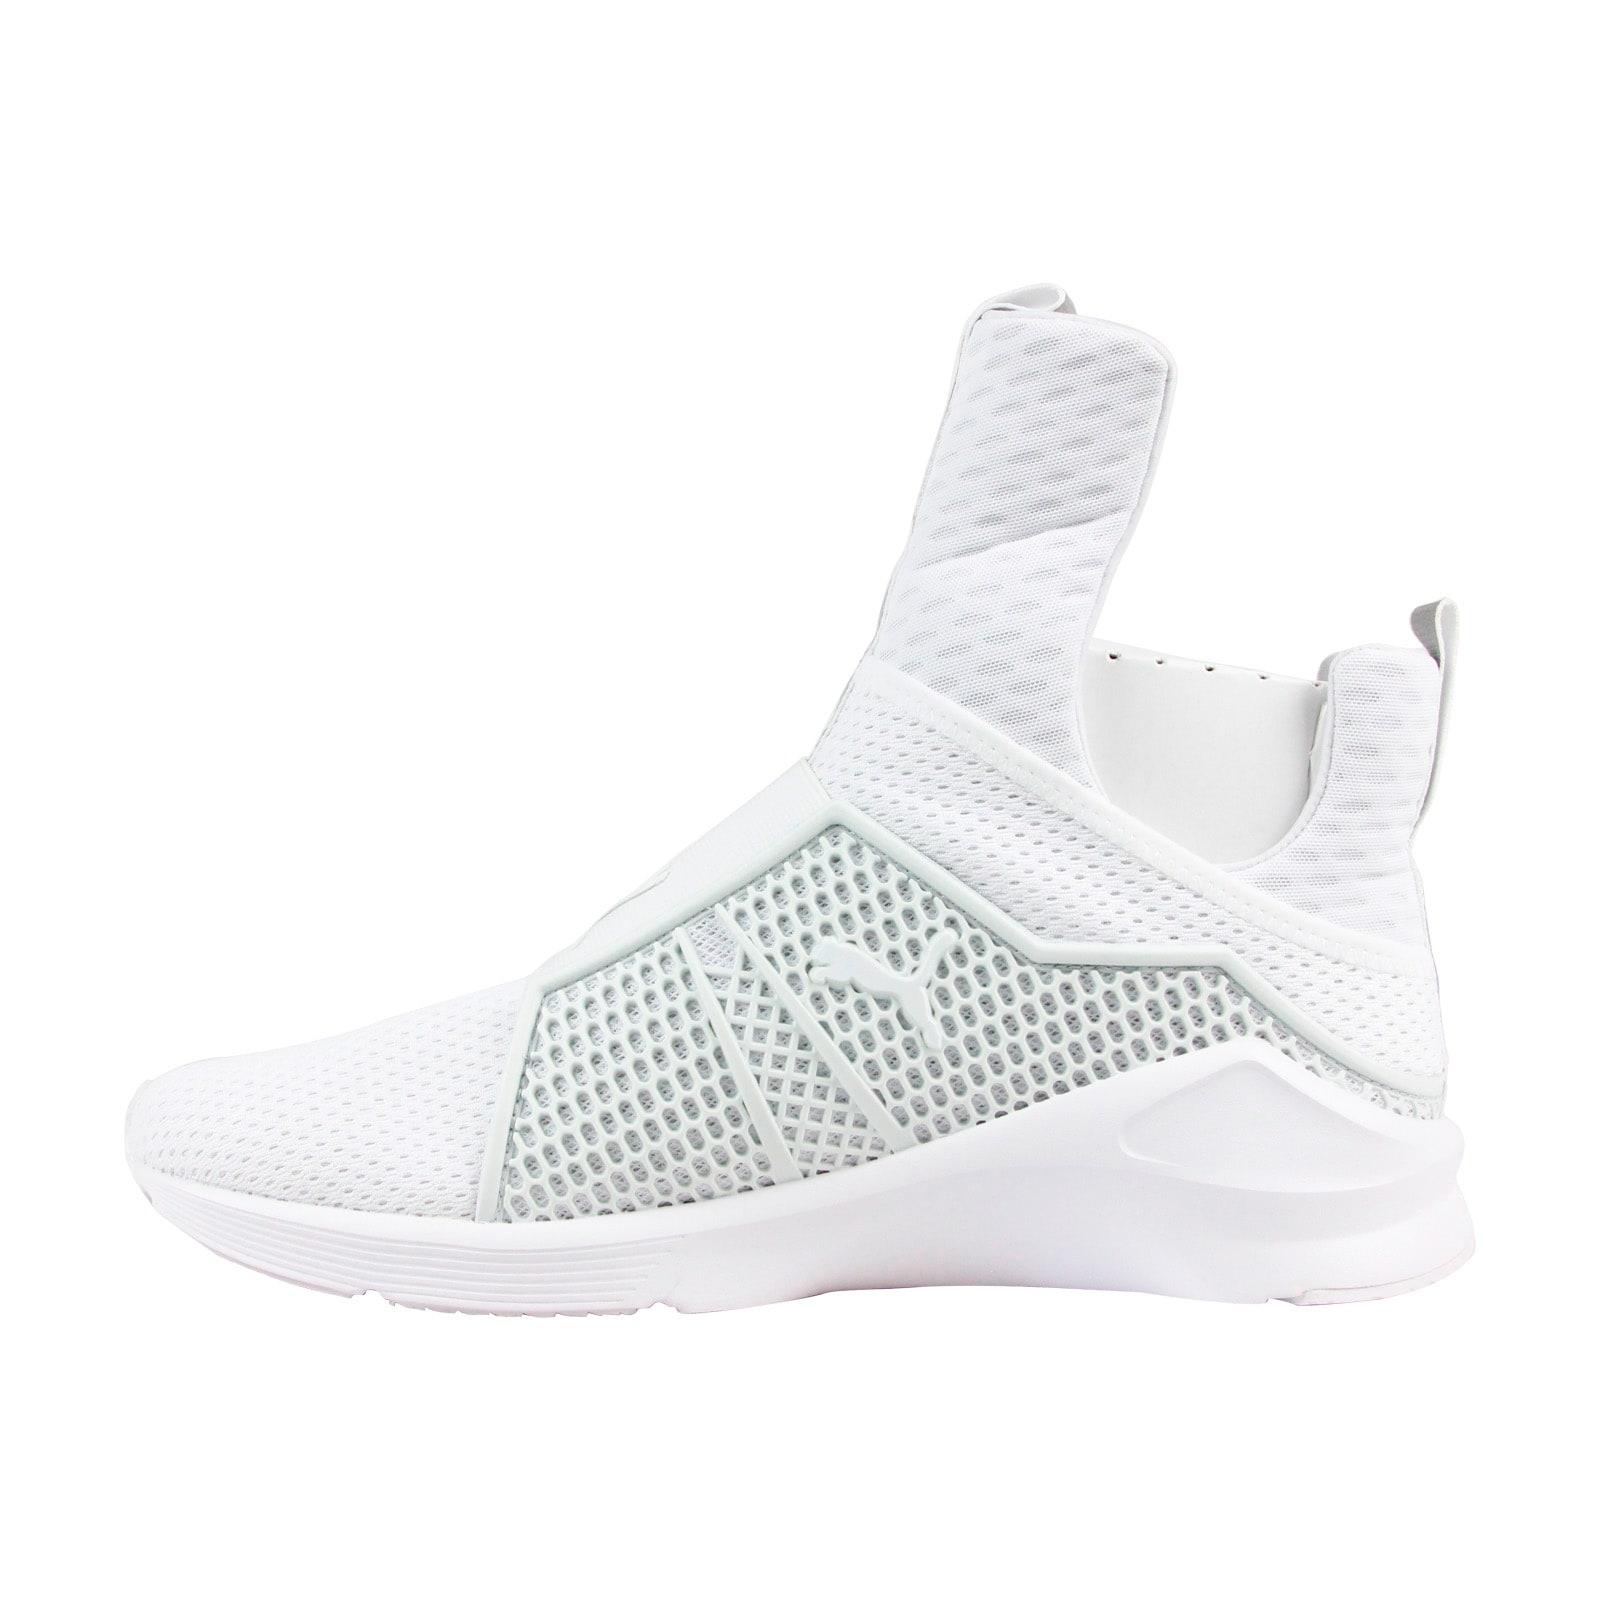 new product e7f3b ecd8b Puma Fenty Trainer Mens White Mesh & Nylon Athletic Slip On Training Shoes